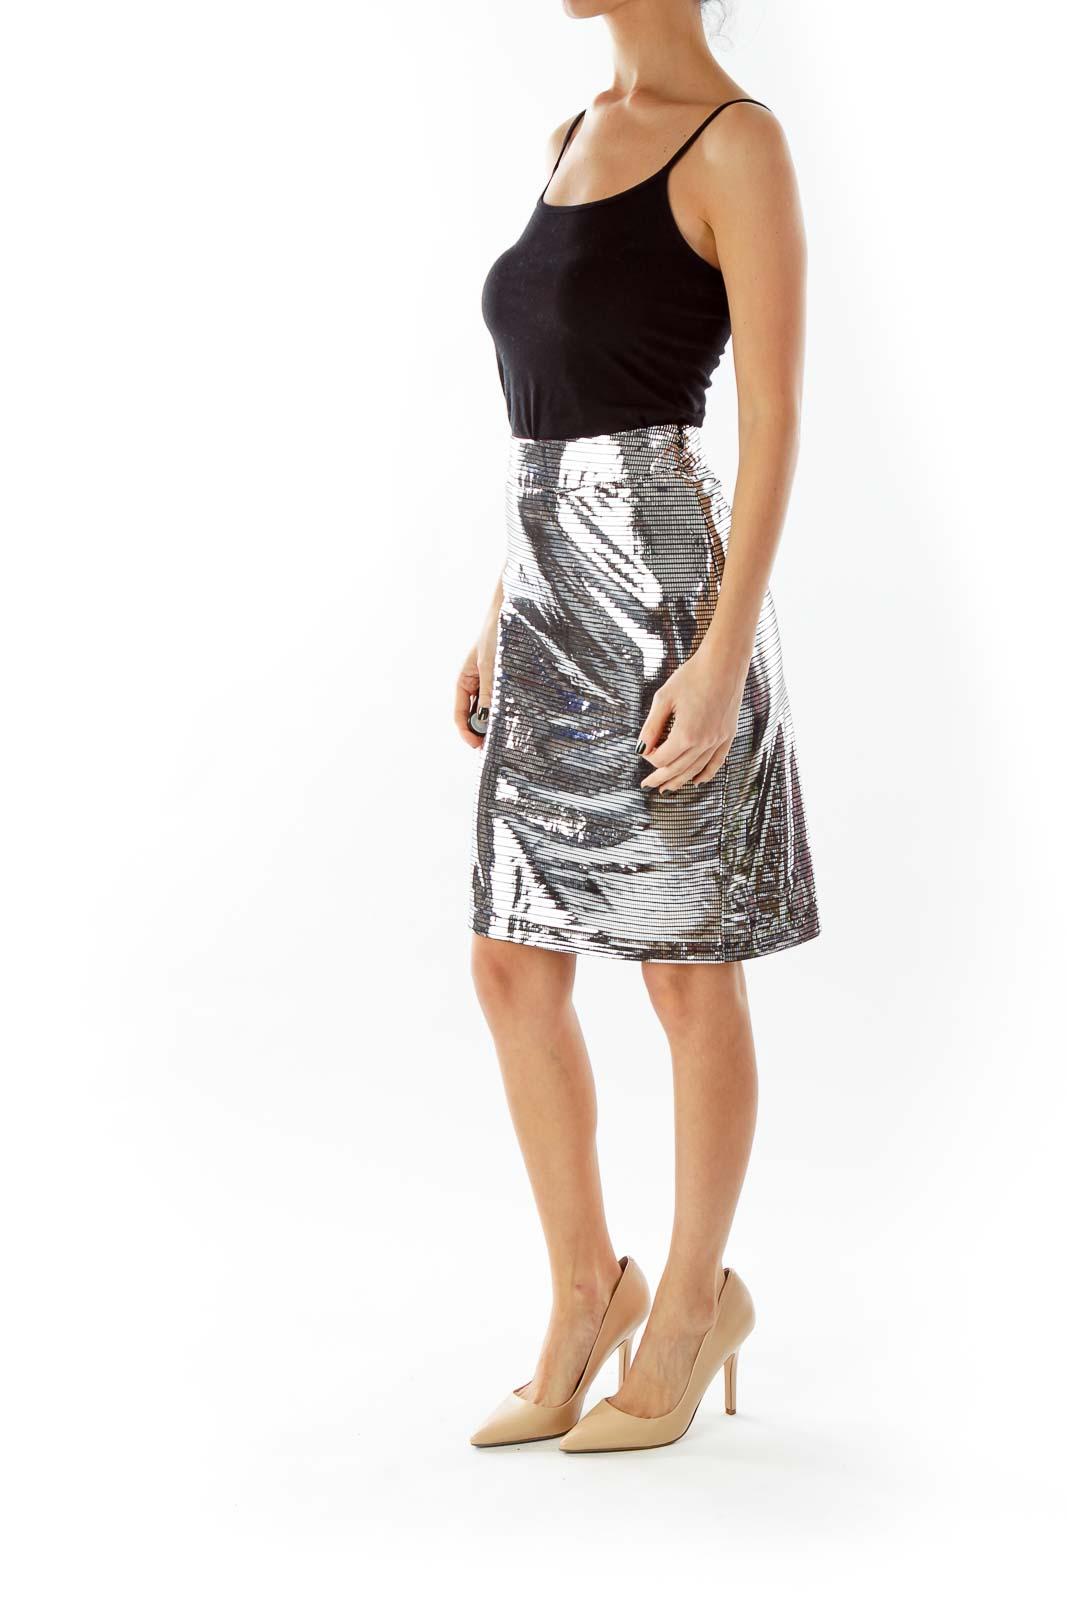 Silver Metallic Pencil Skirt